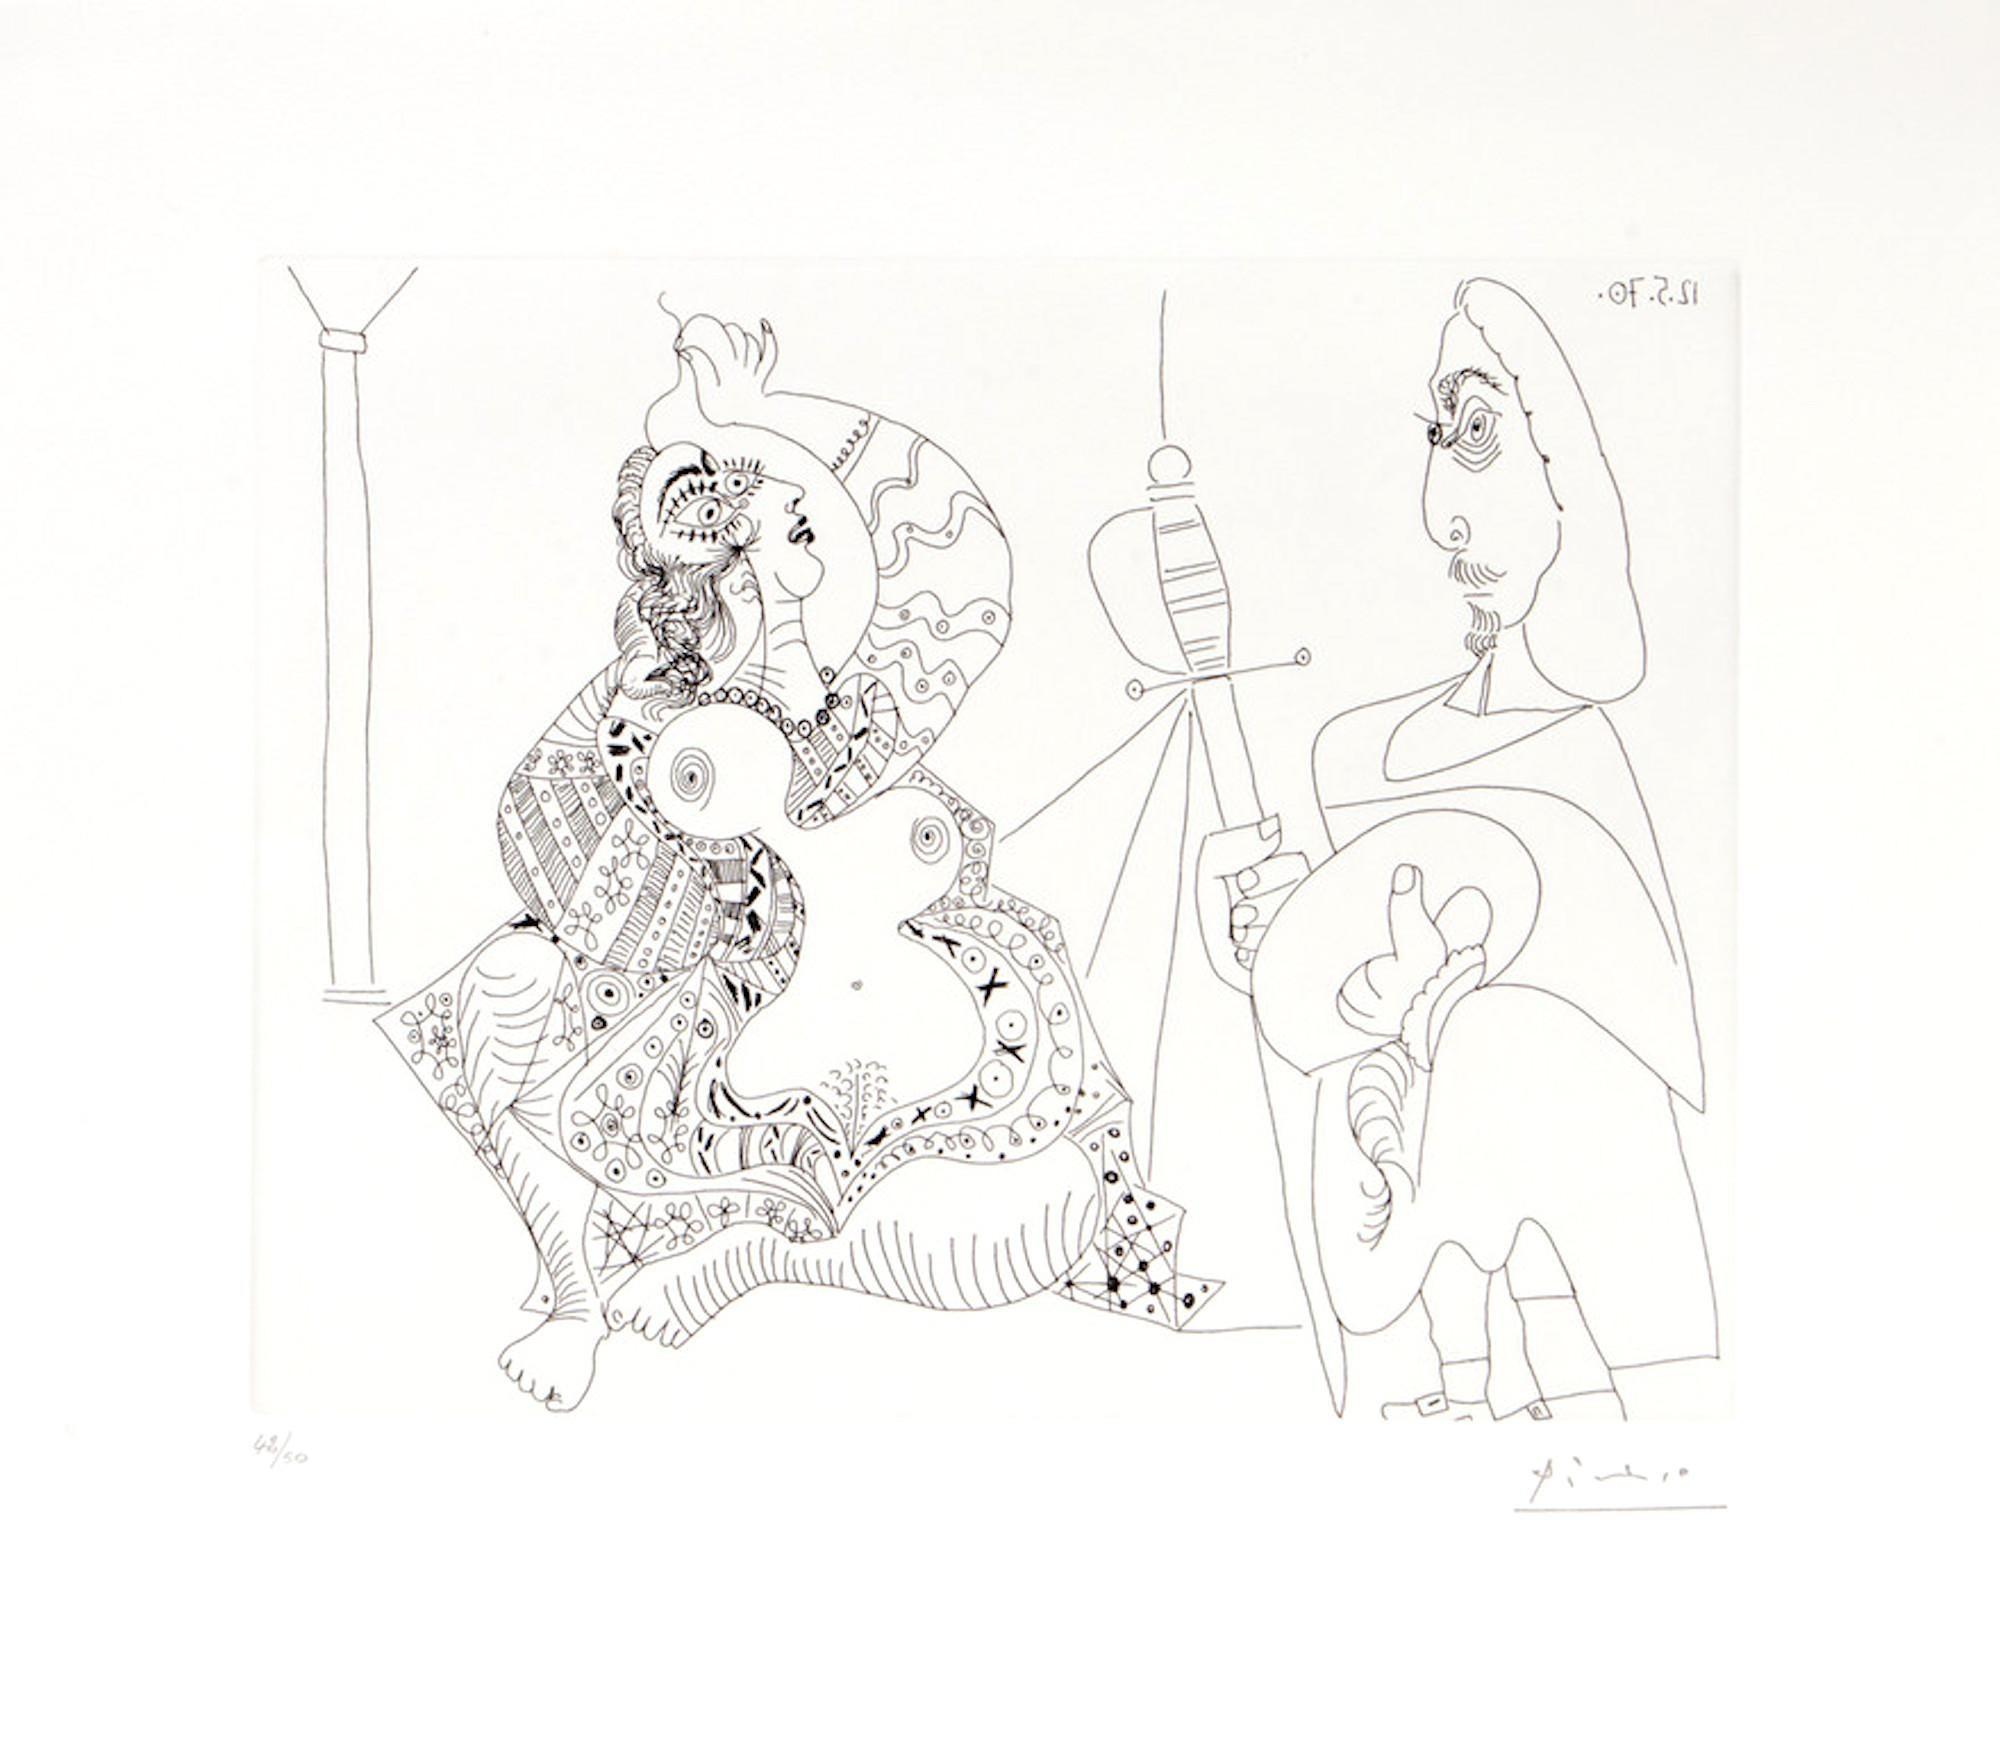 156 Series No.47 - Original Etching by P. Picasso - 1970